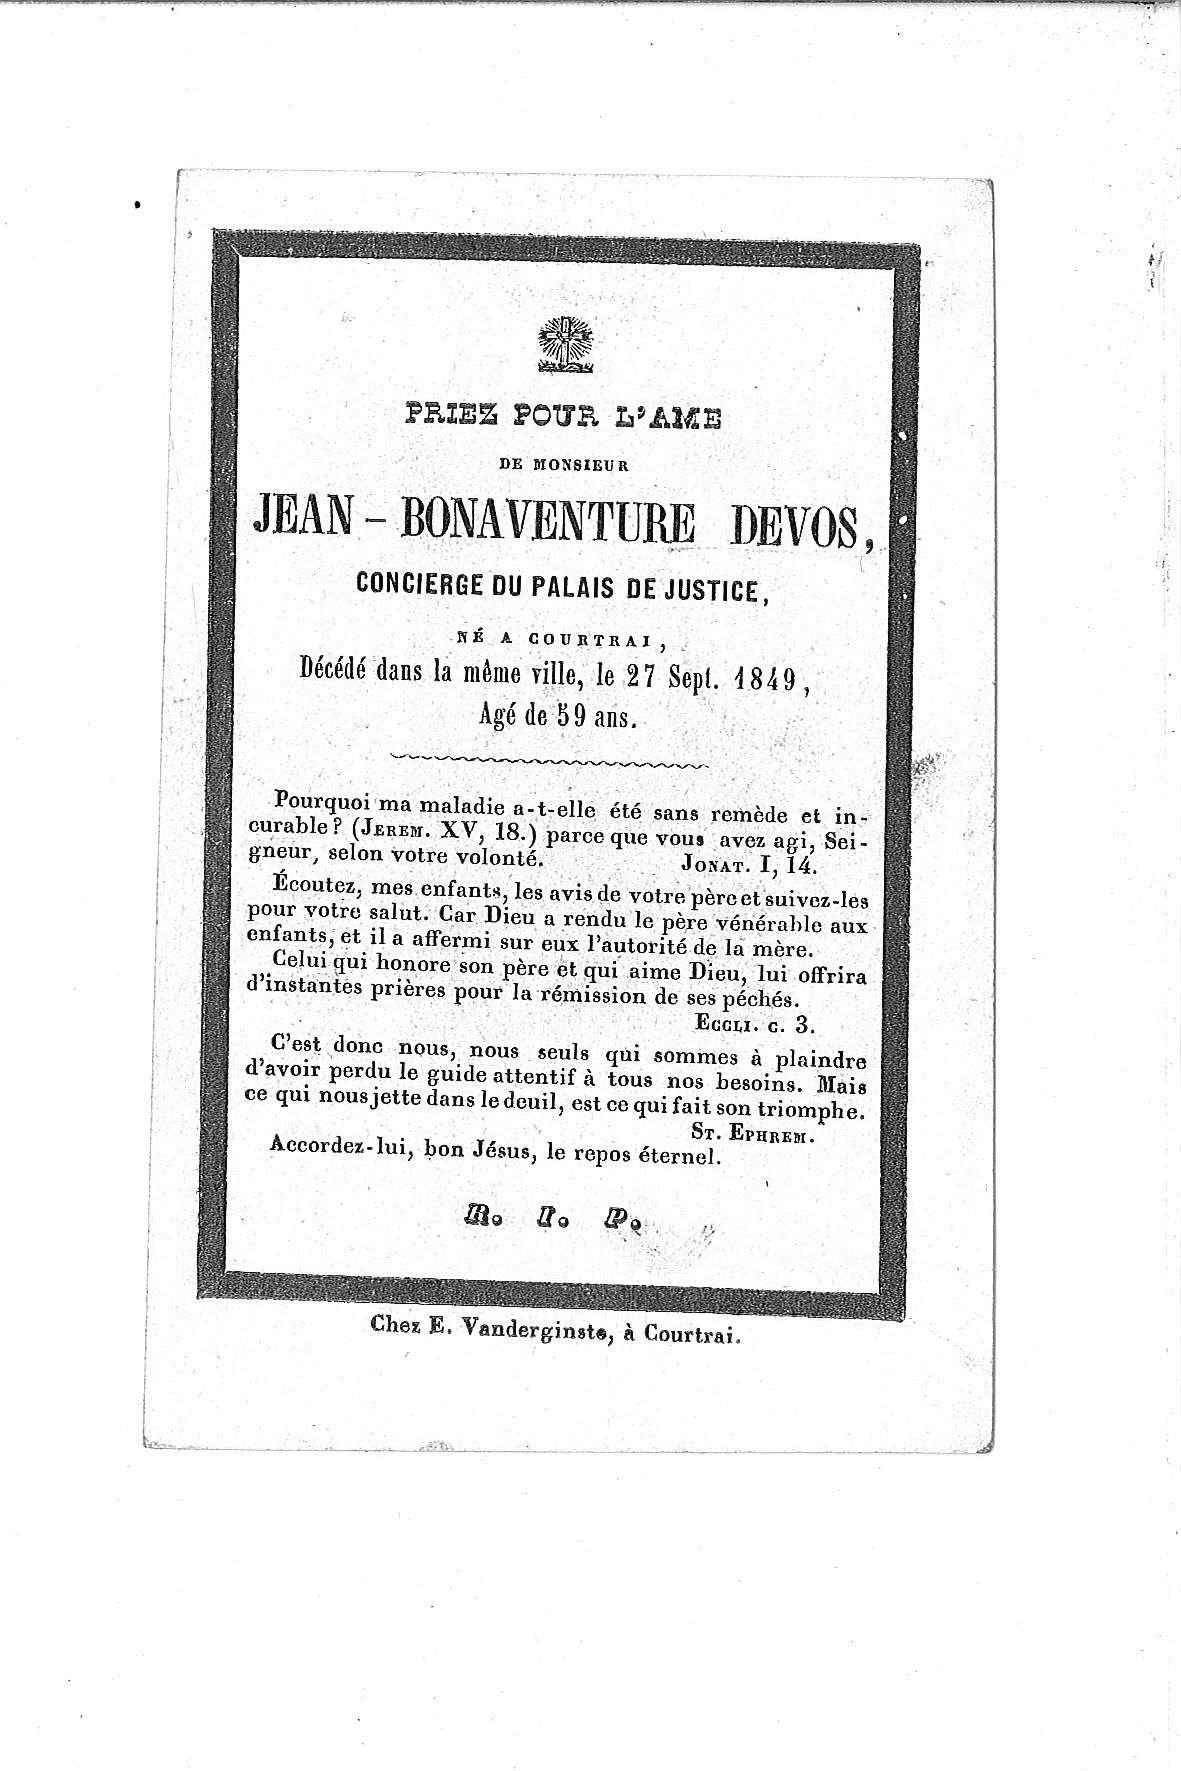 Jean-Banaventure (1849) 20120229094155_00066.jpg